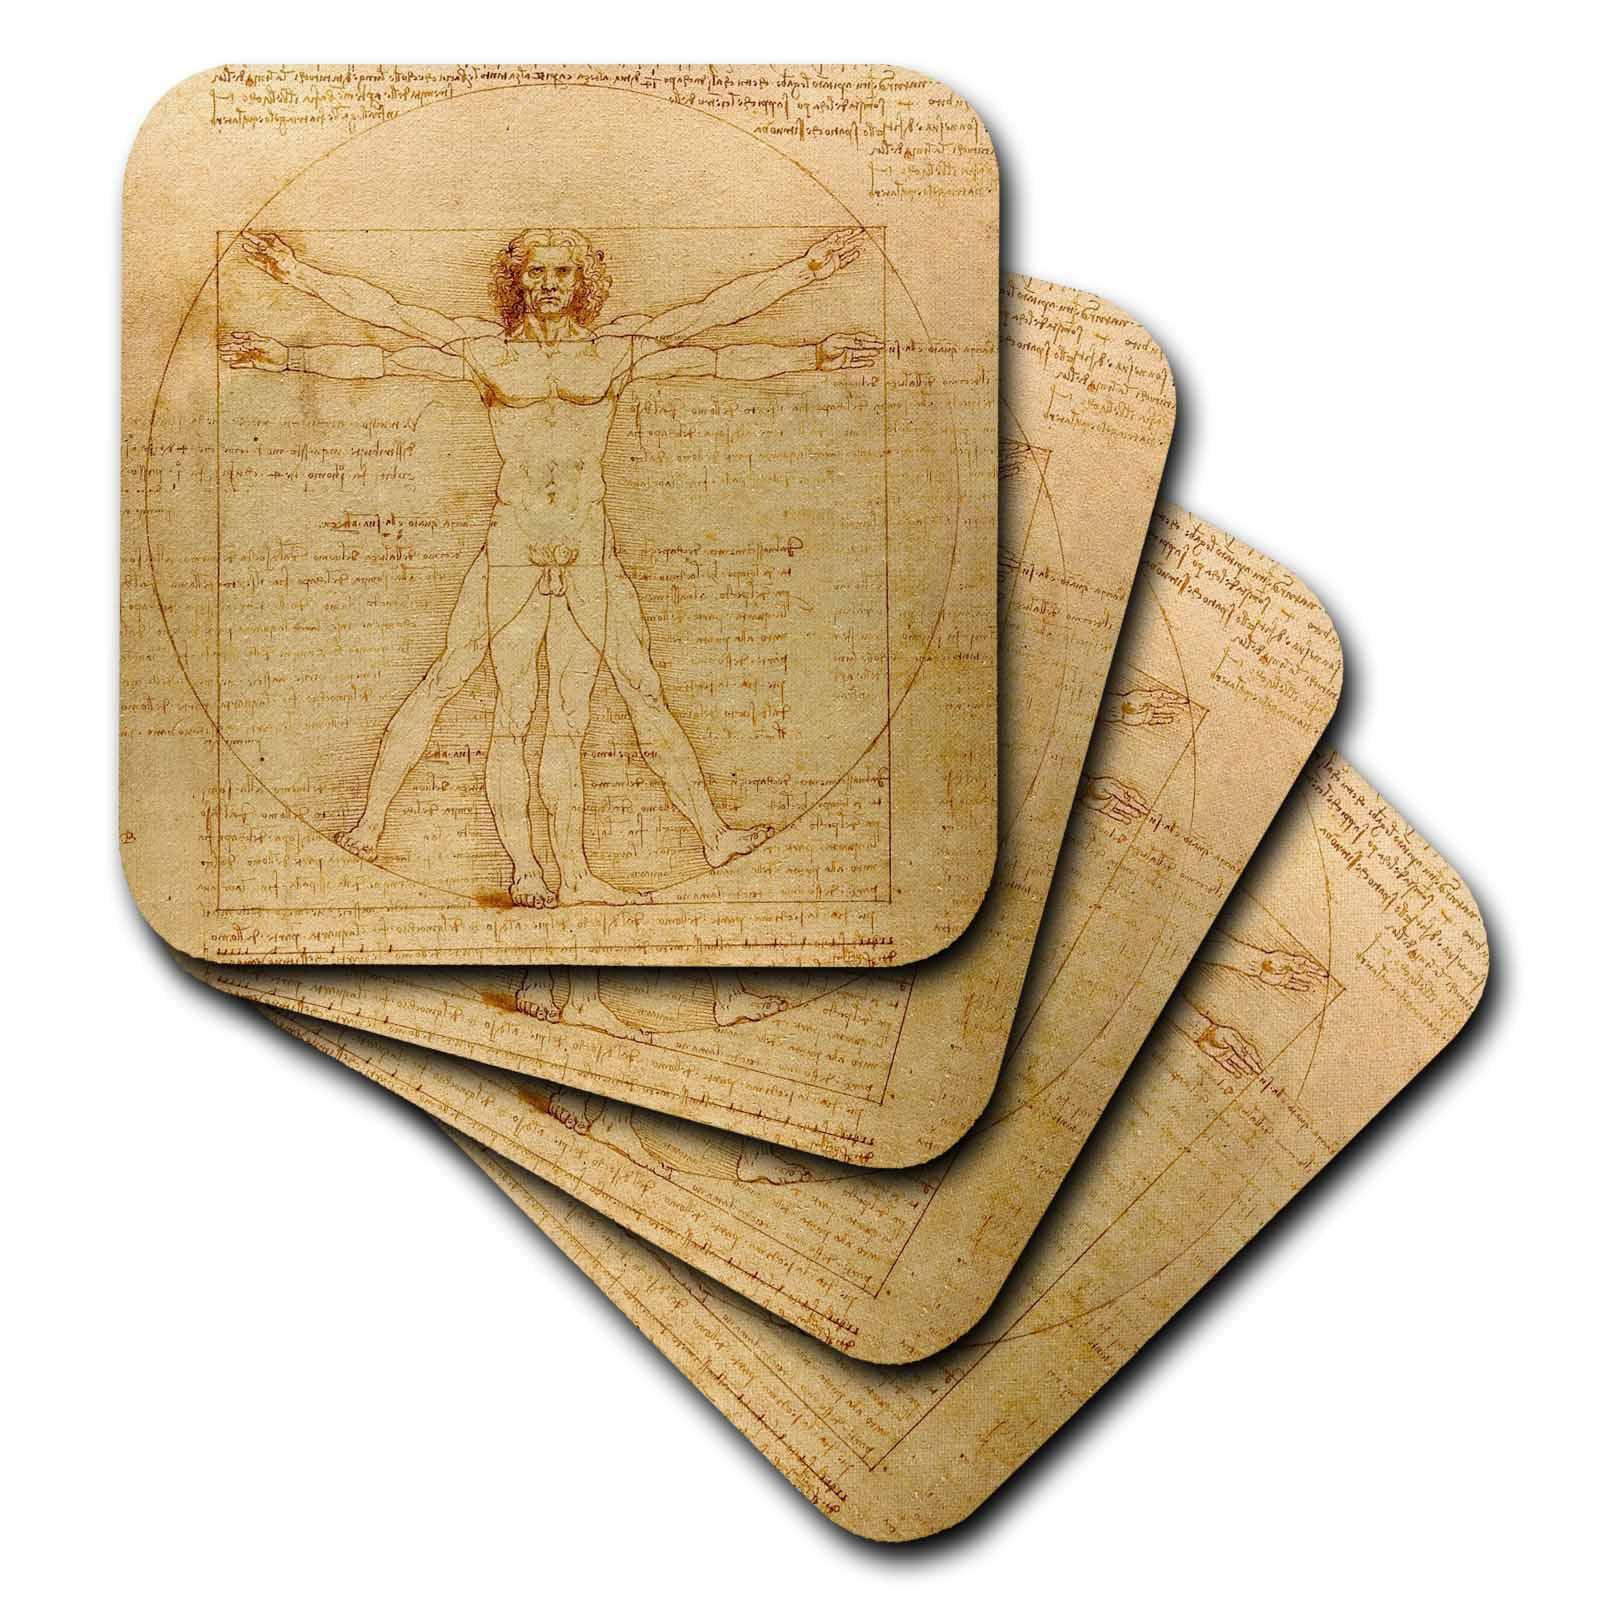 3drose Vitruvian Man By Leonardo Da Vinci 1490 Fine Anatomical Art